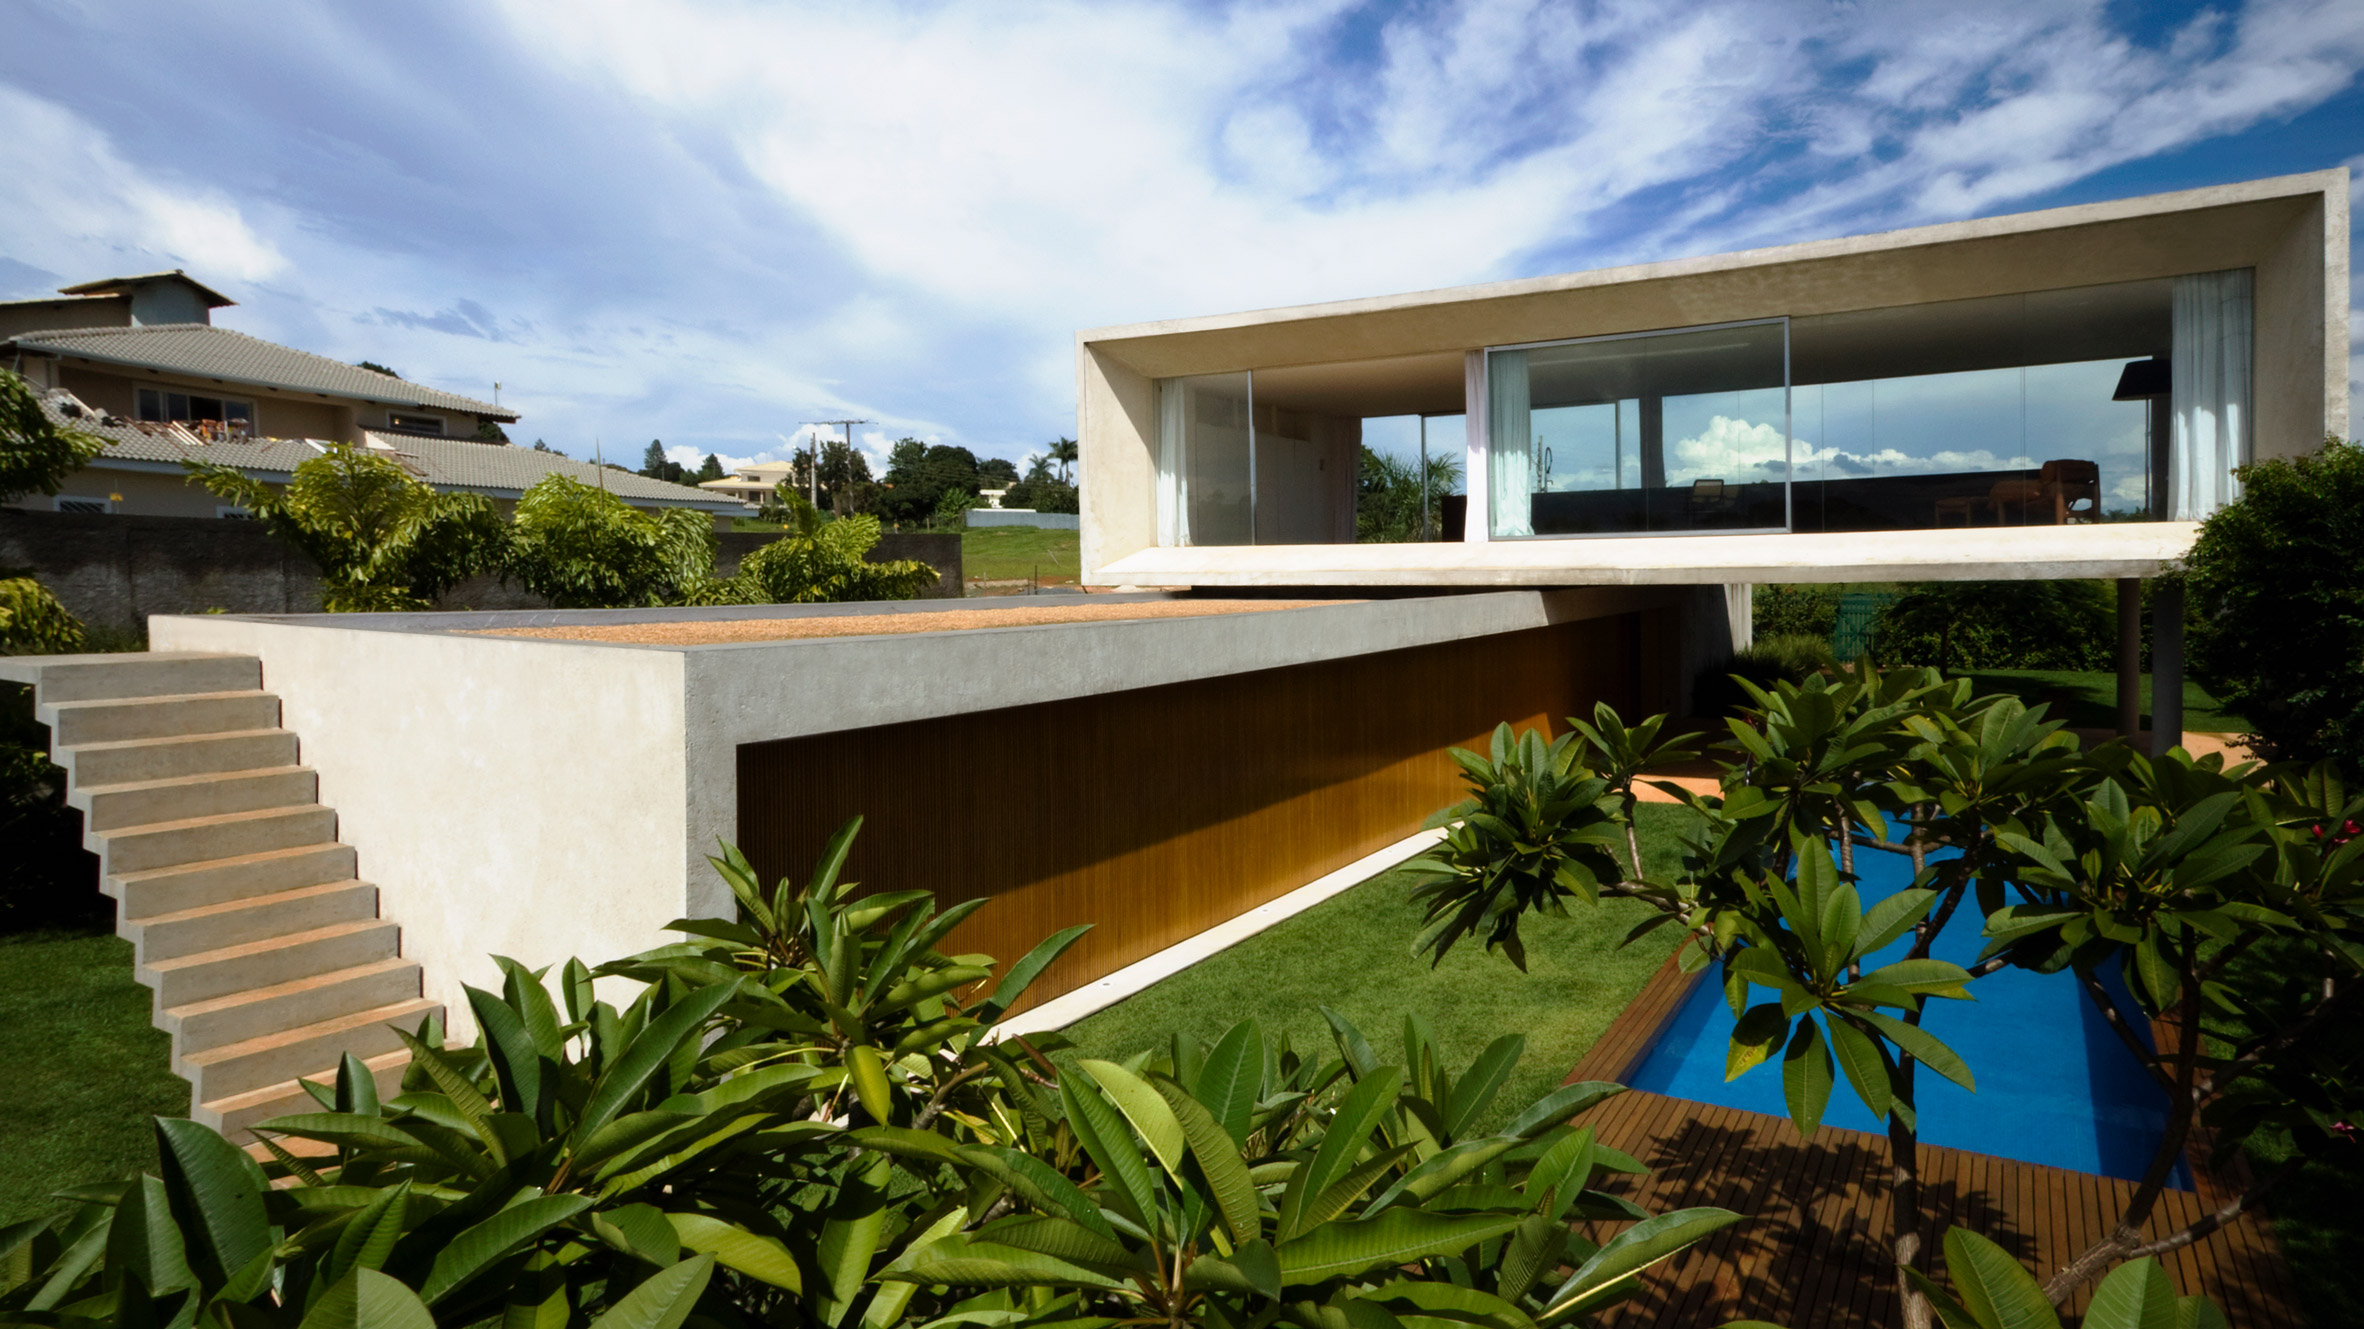 Brazilian Houses Studio Mk27 Takes Cues From Brazilian Modernism For Osler House In